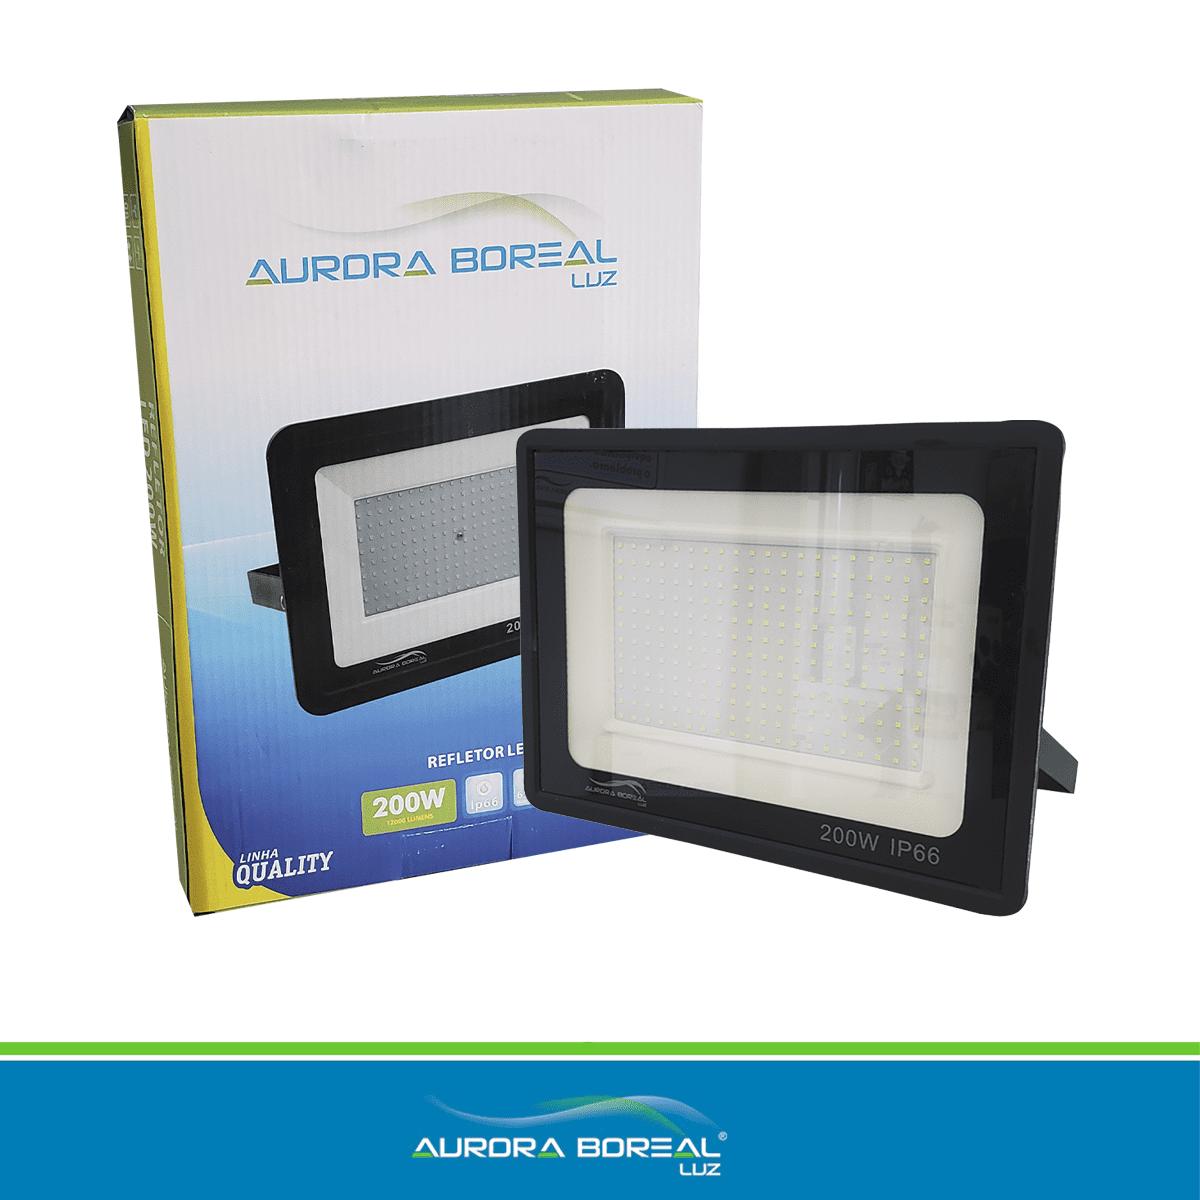 REFLETOR LED QUALITY 200W - 6500K (Branco Frio)